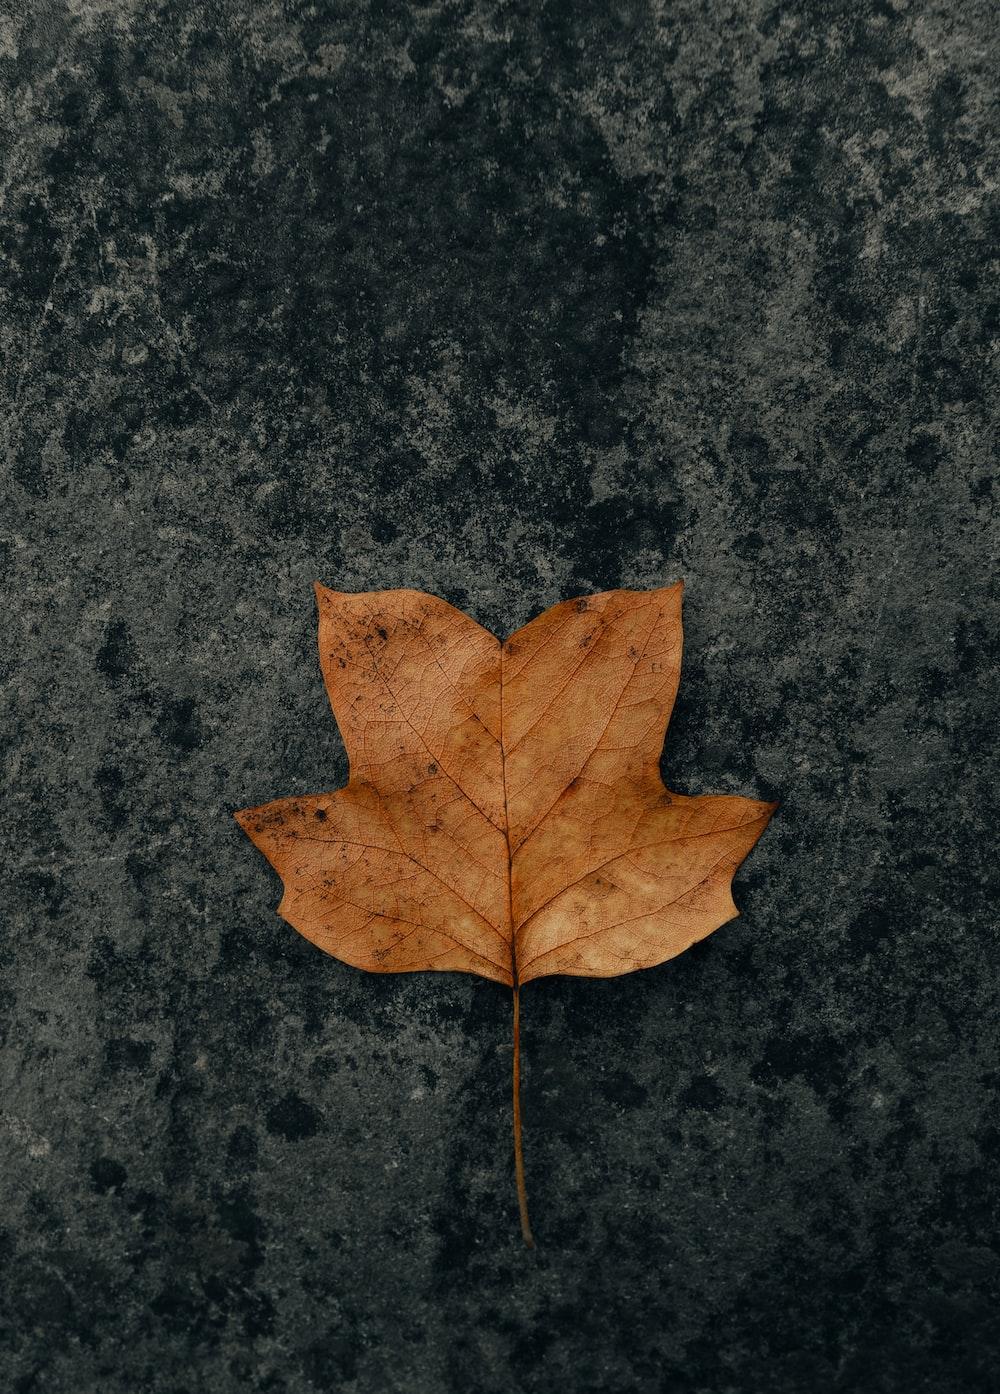 brown maple leaf on black marble table